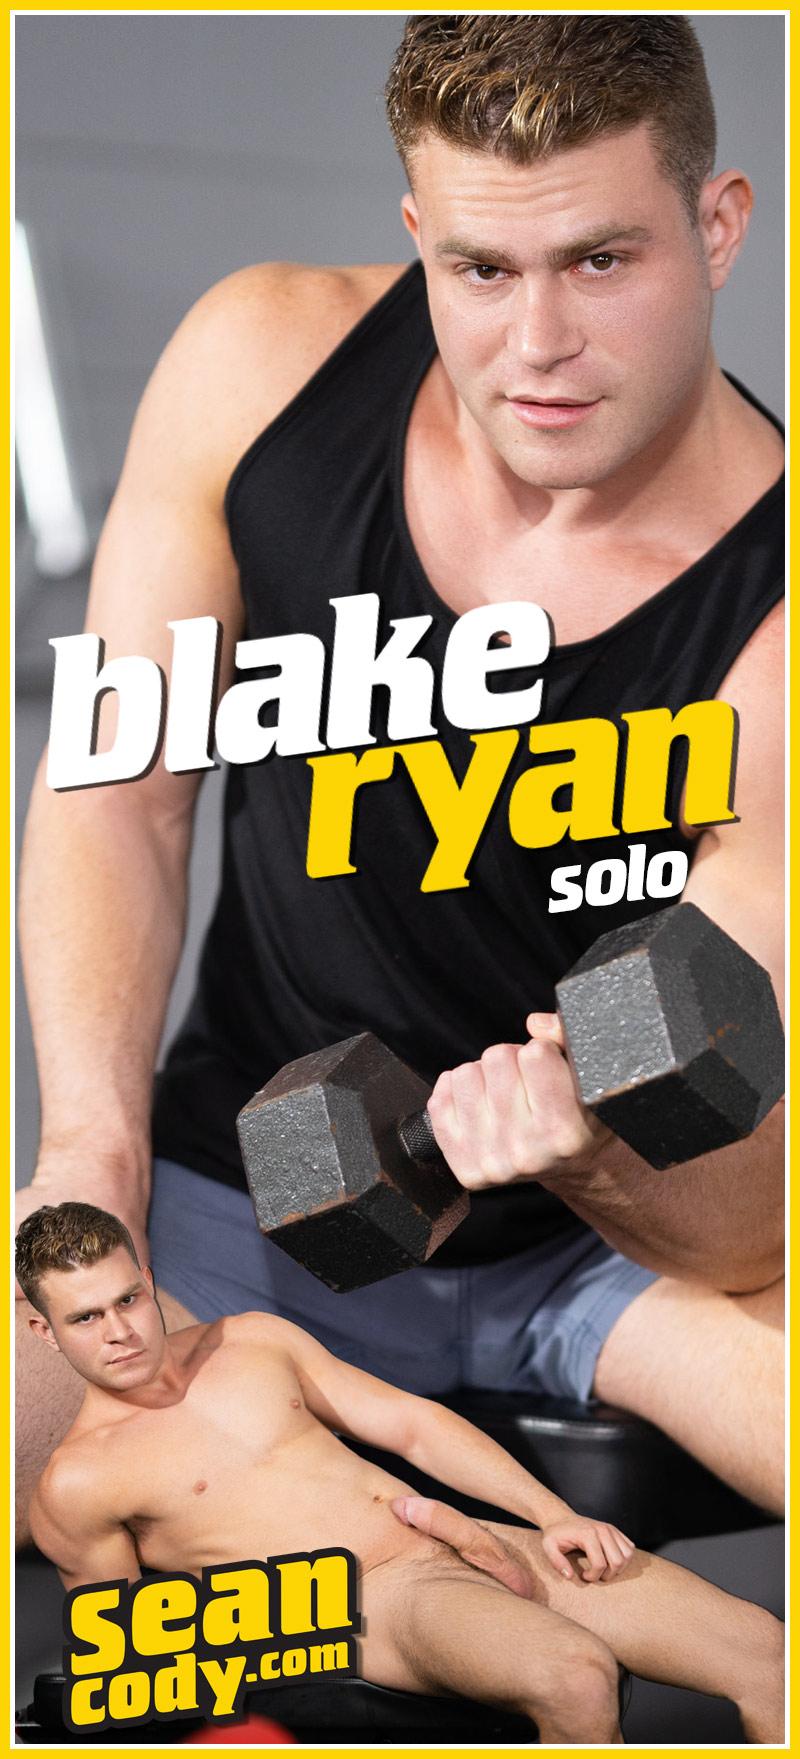 Blake Ryan - Solo Cover